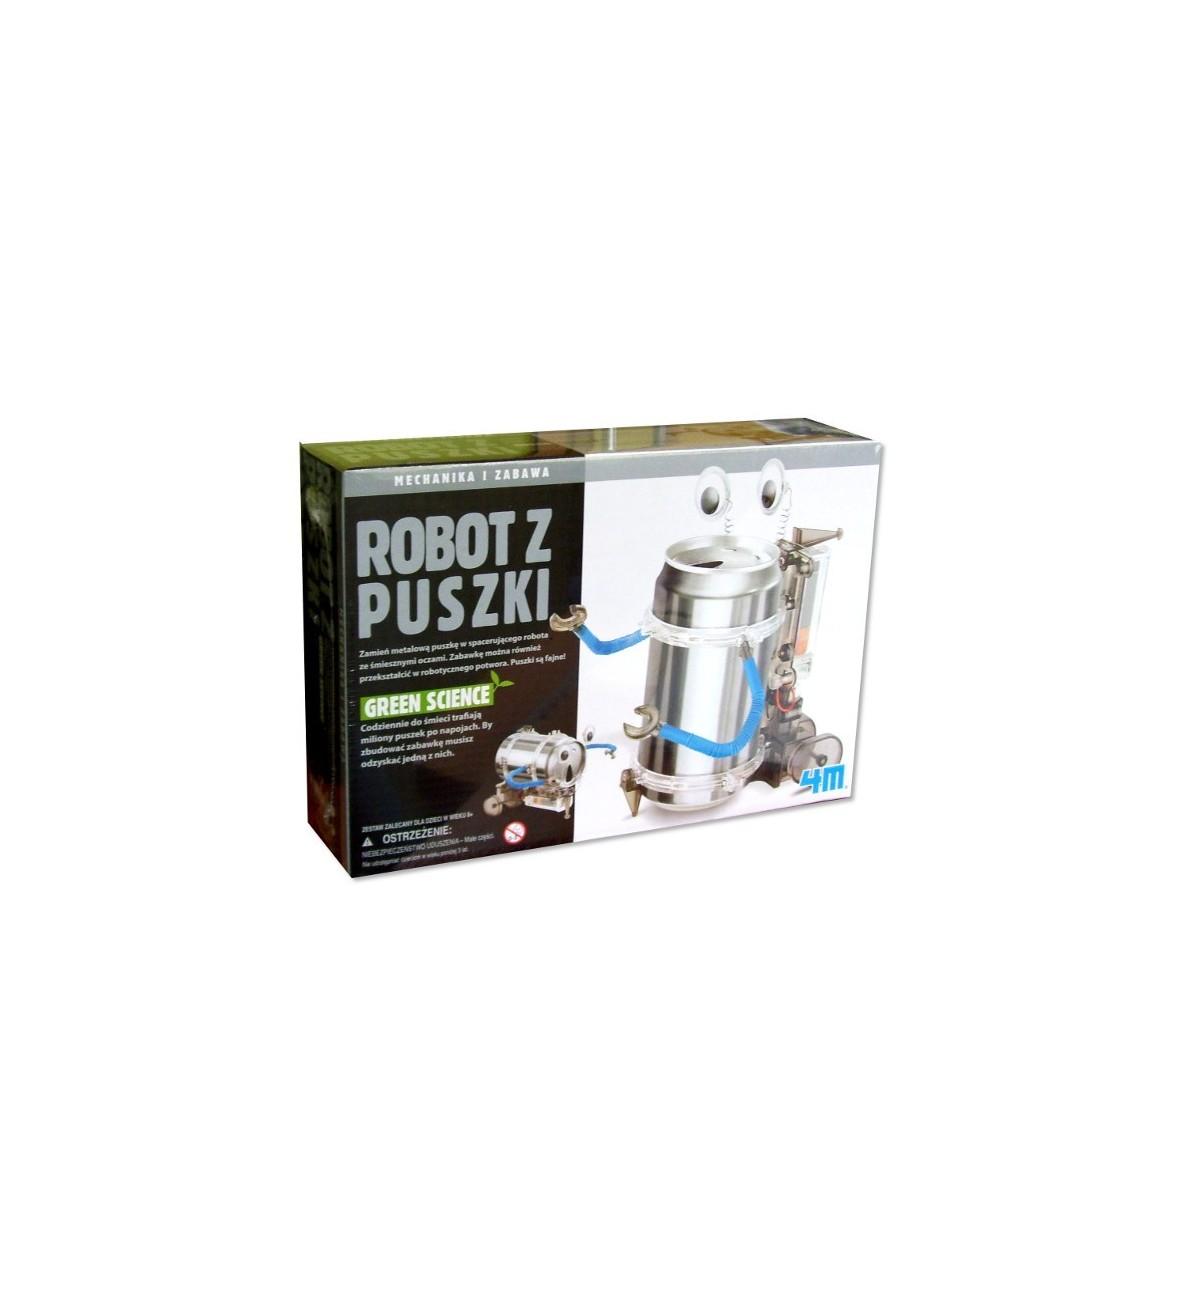 4M Robot z Puszki